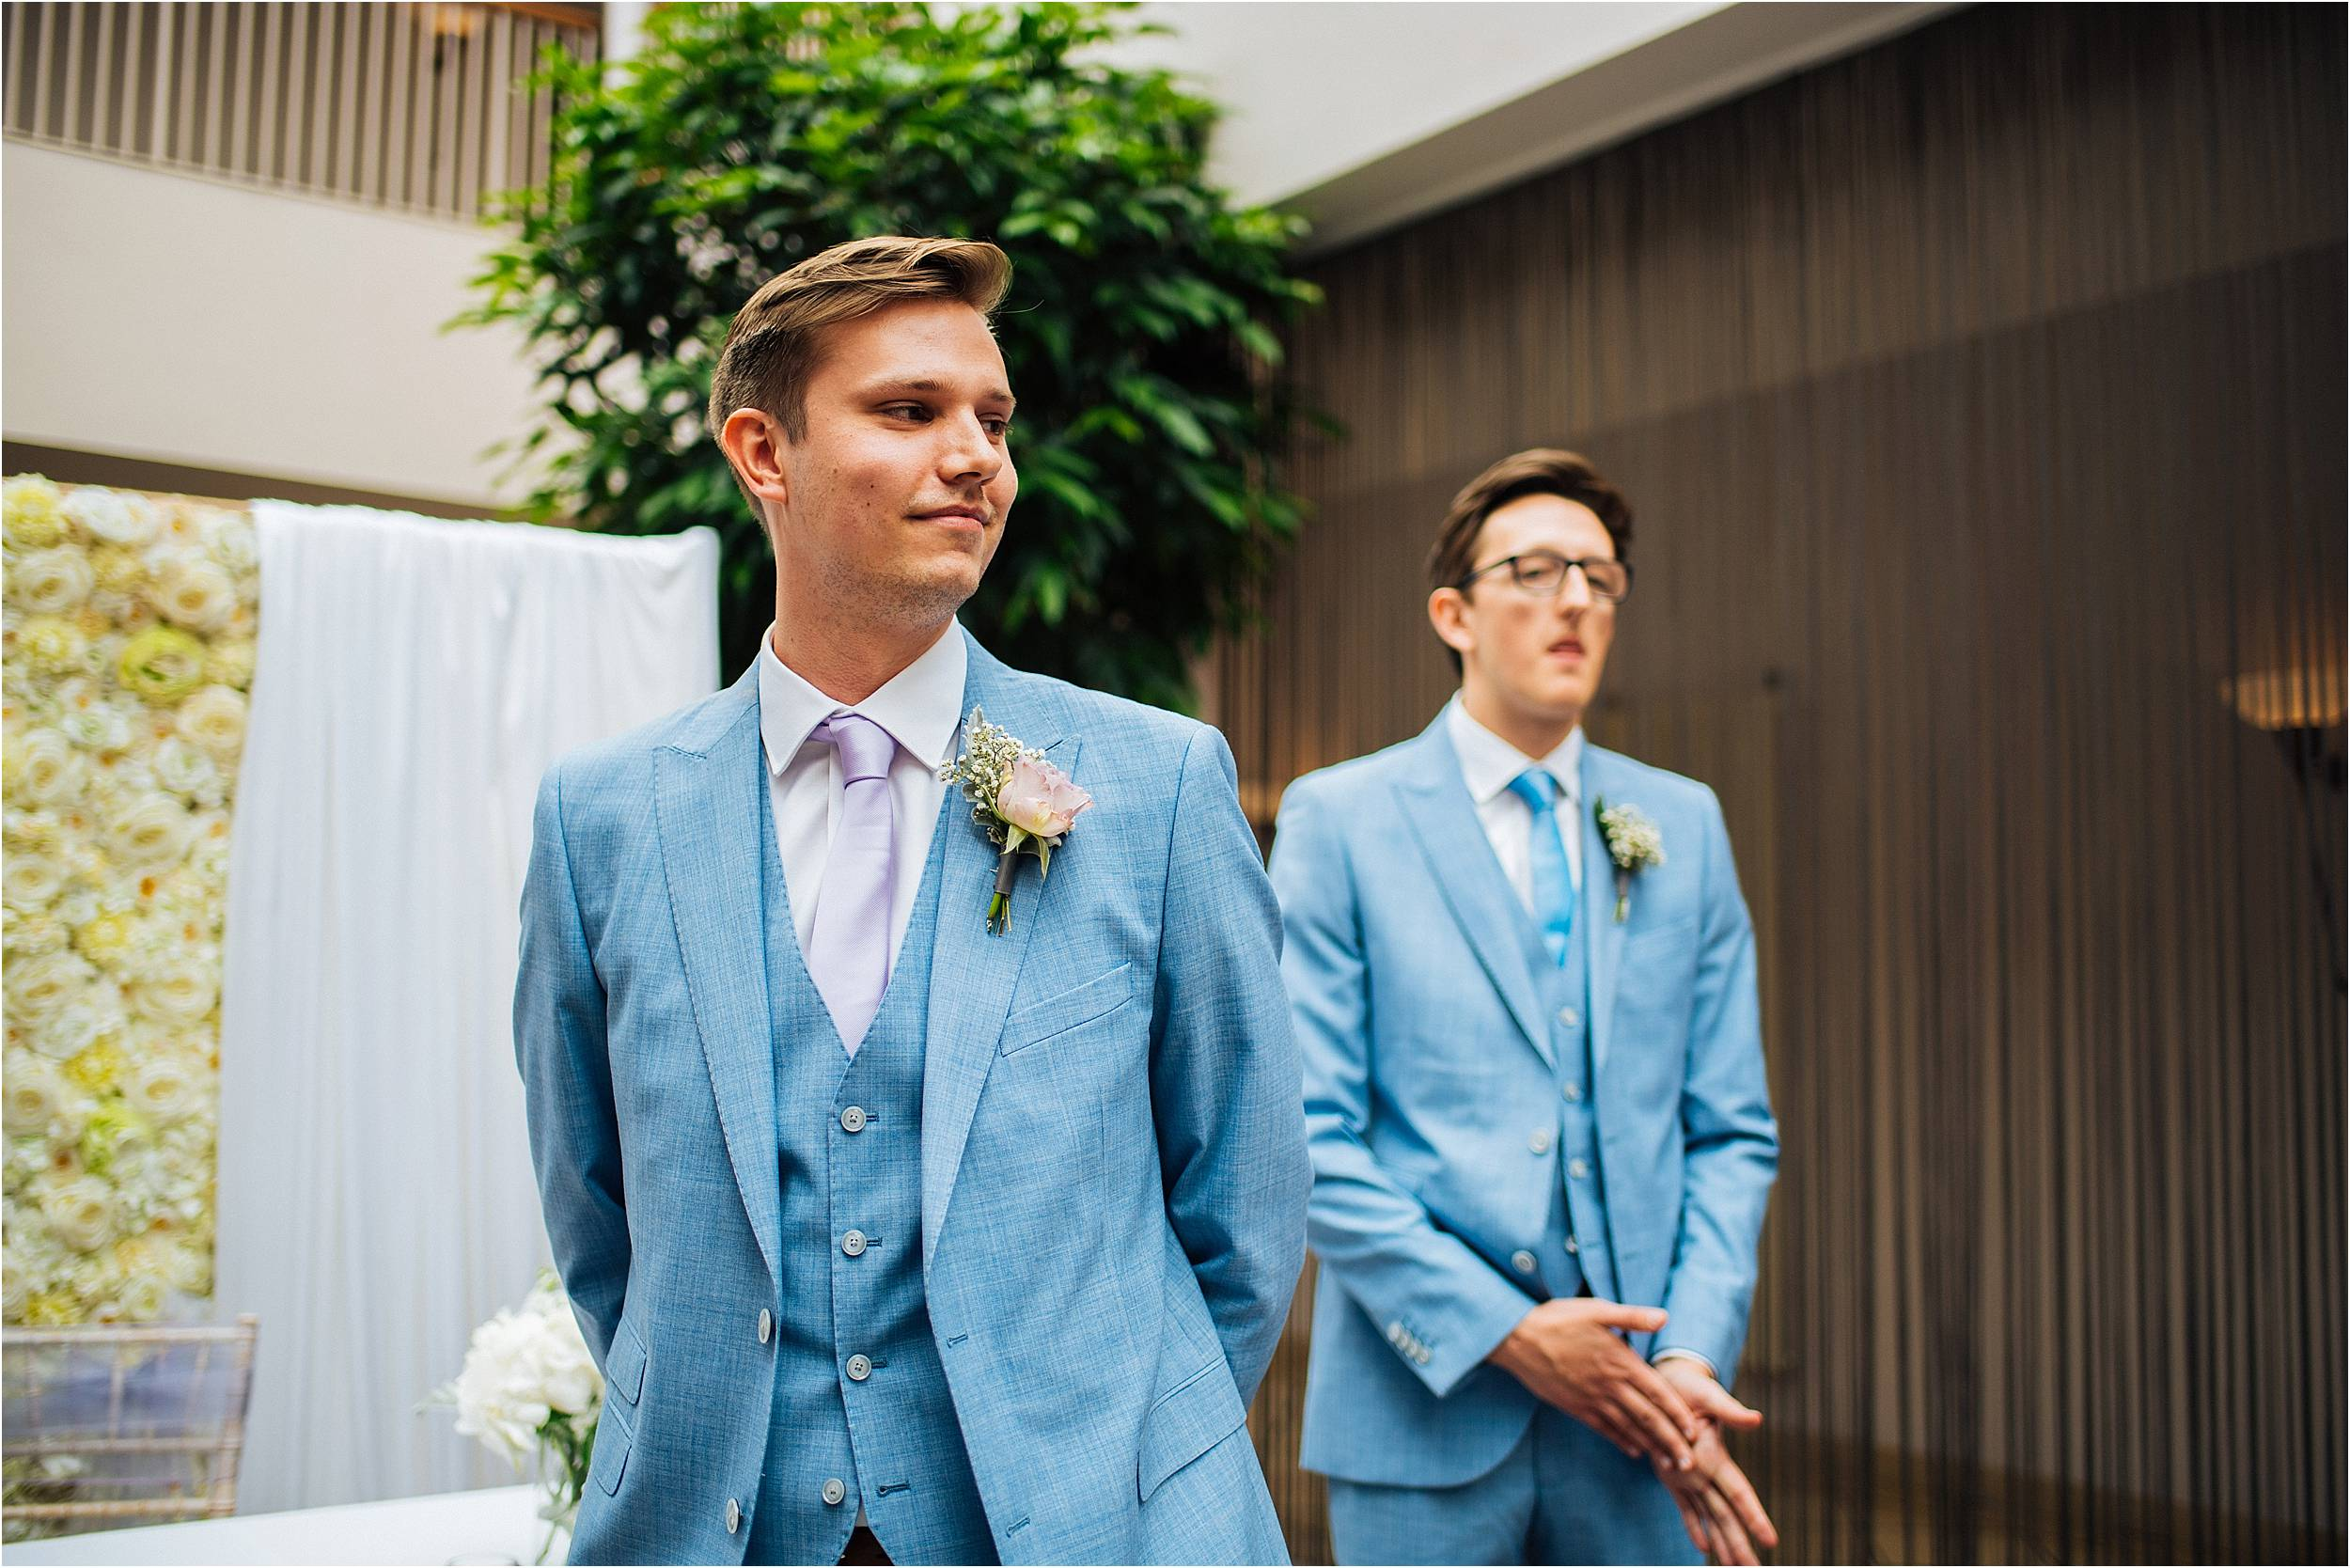 Seaham Hall Wedding Photography_0022.jpg